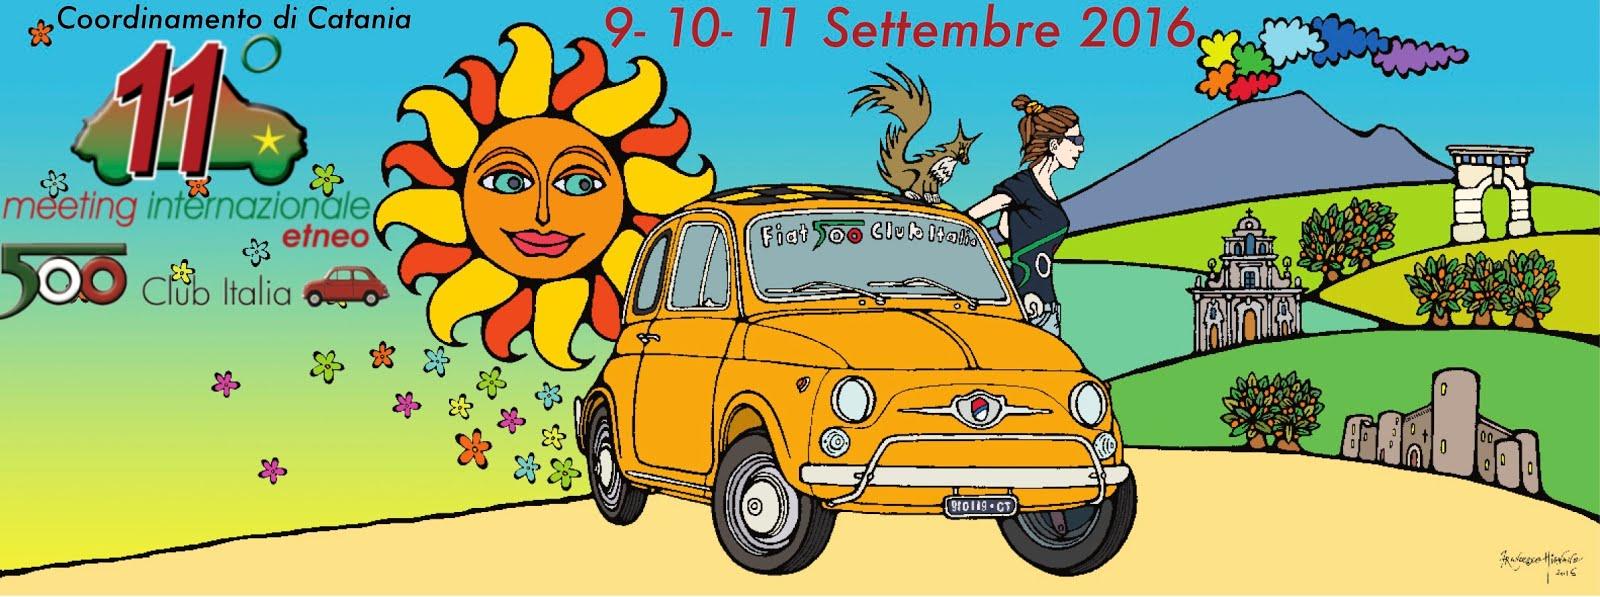 Fiat 500 Club Italia Coordinamento Catania